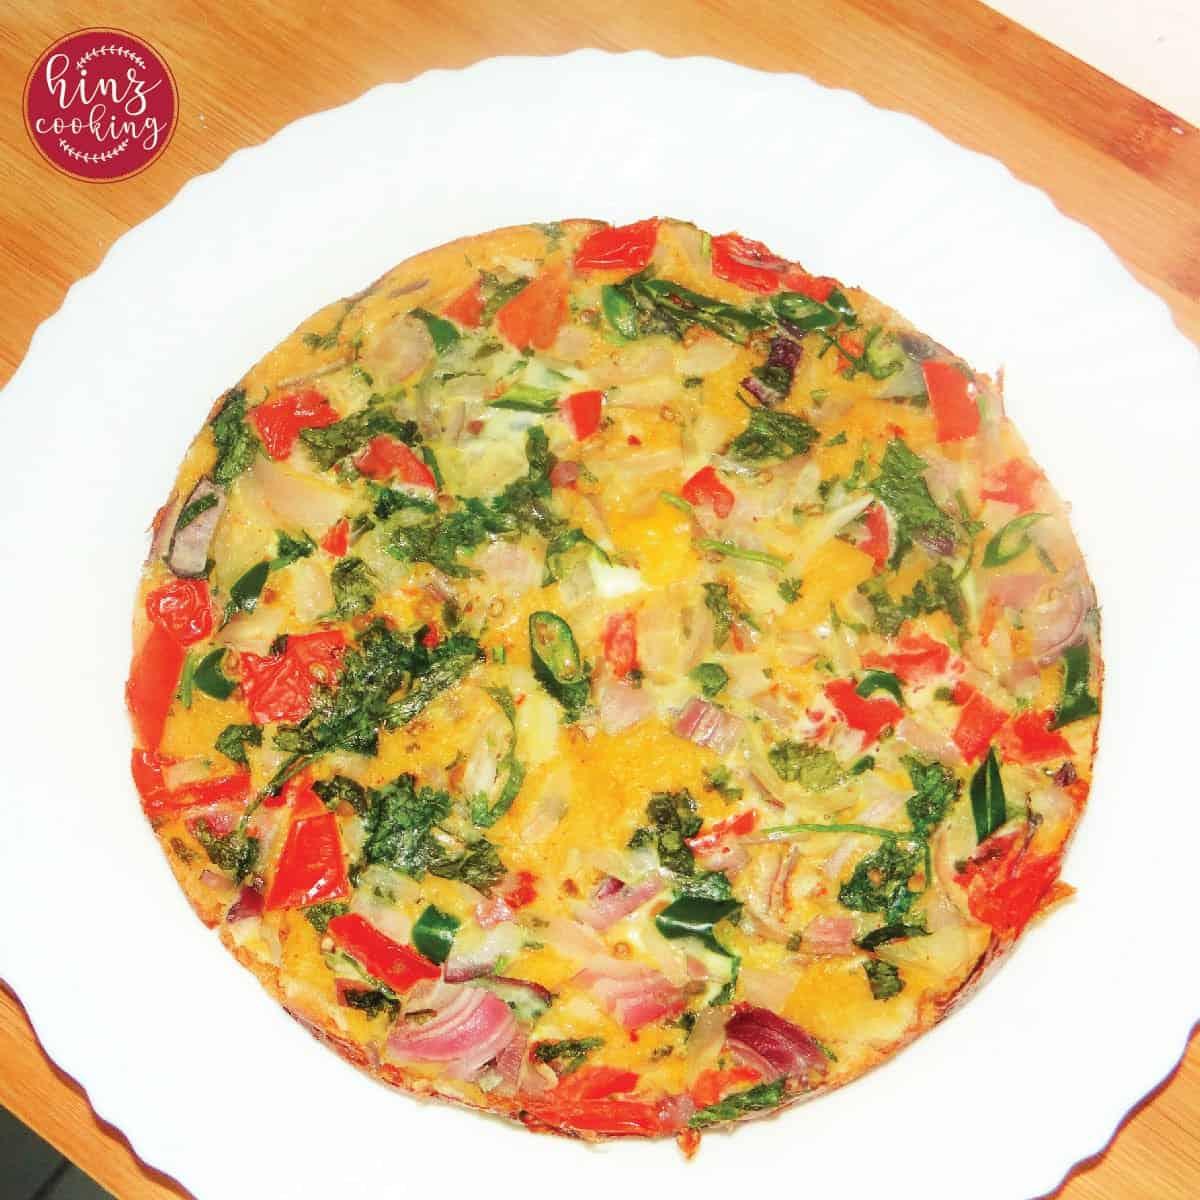 Easy Egg And Bread Breakfast Recipe Idea